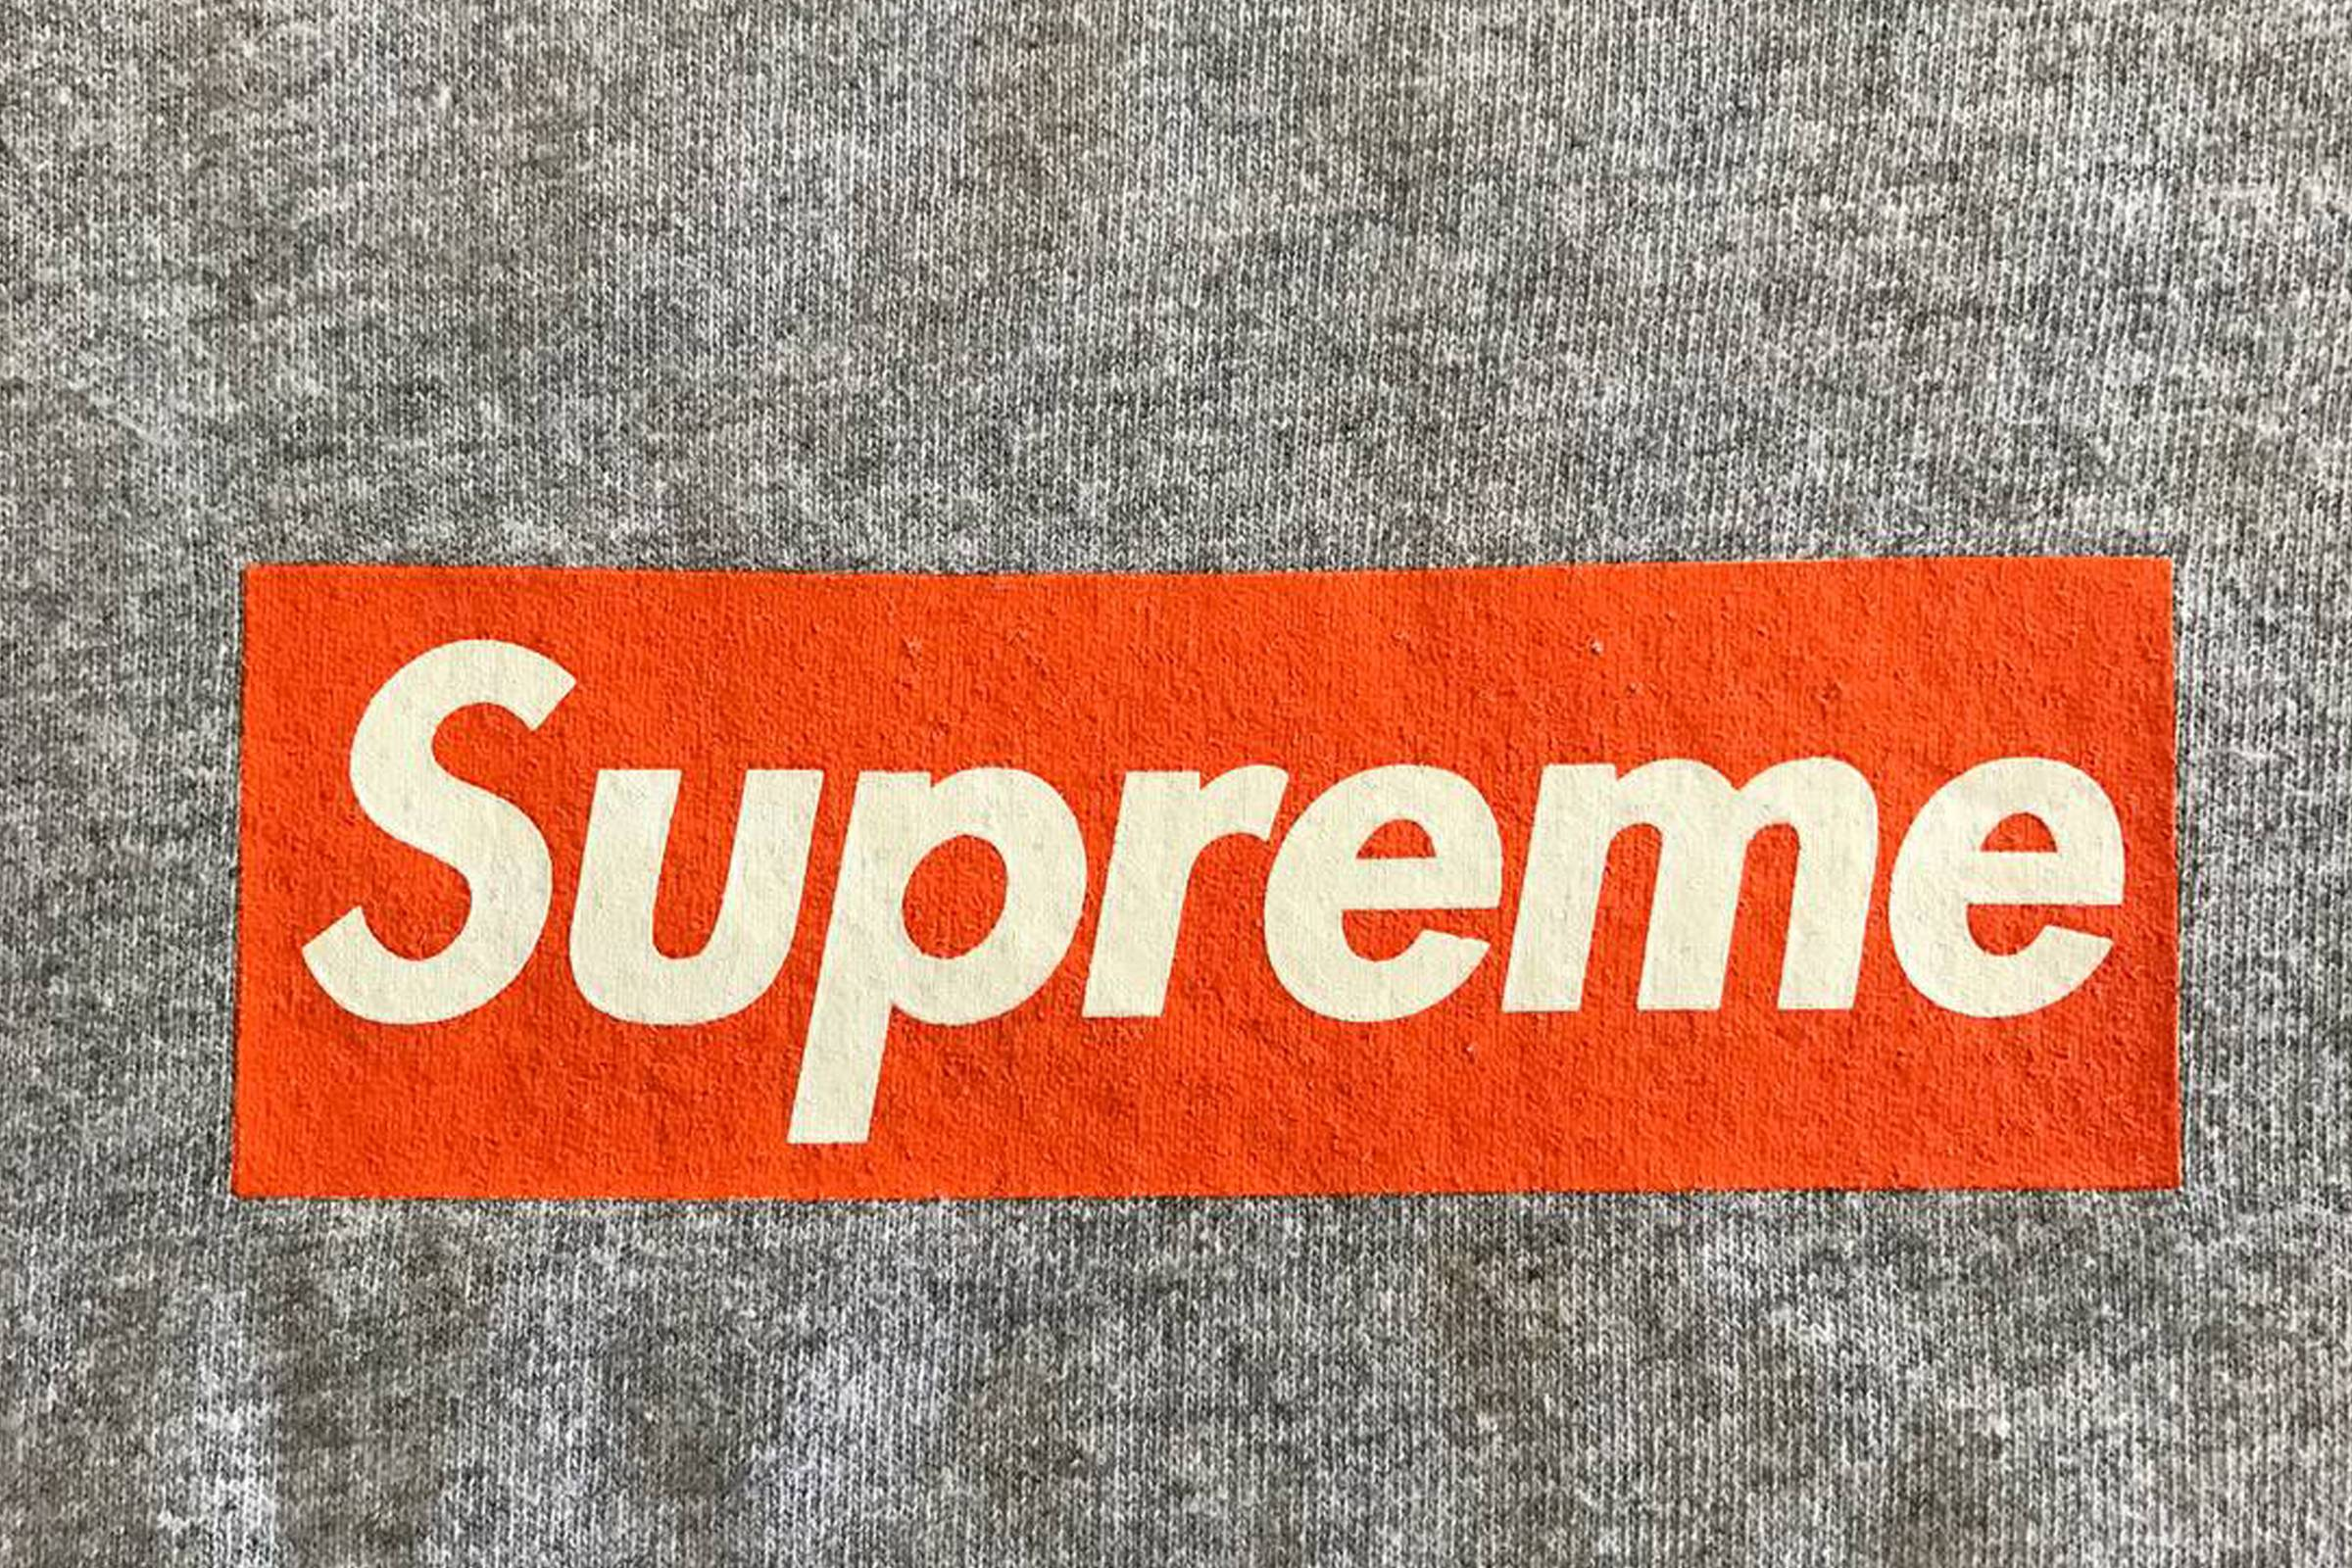 Supreme 1998 Orange Box Logo, from the wardrobe of Nick Rubin